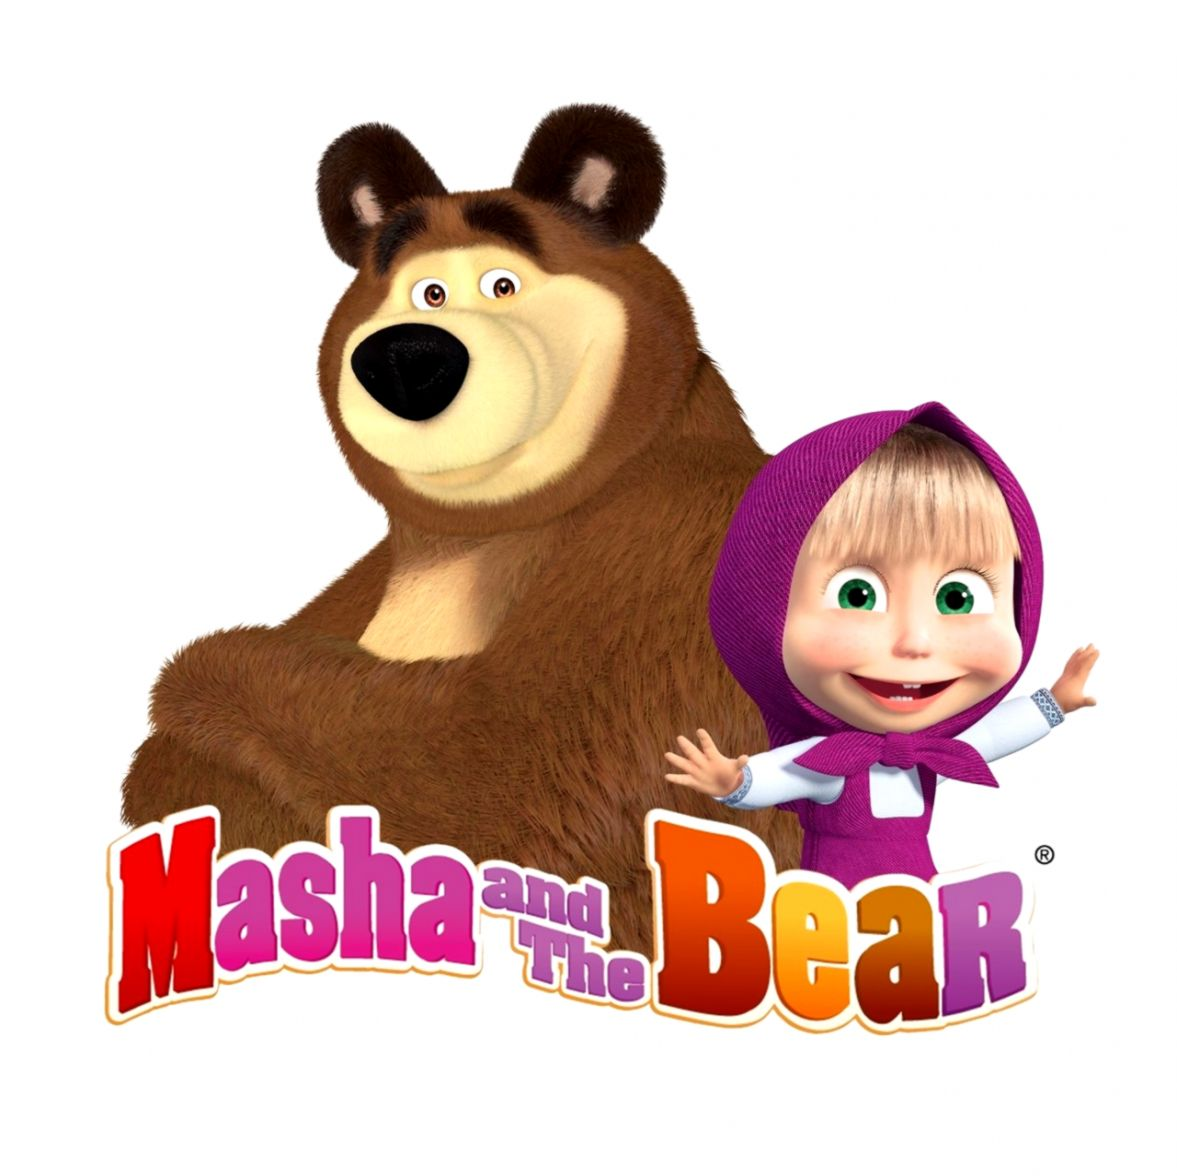 Masha Bear Images Hd Cute Wallpapers Turret